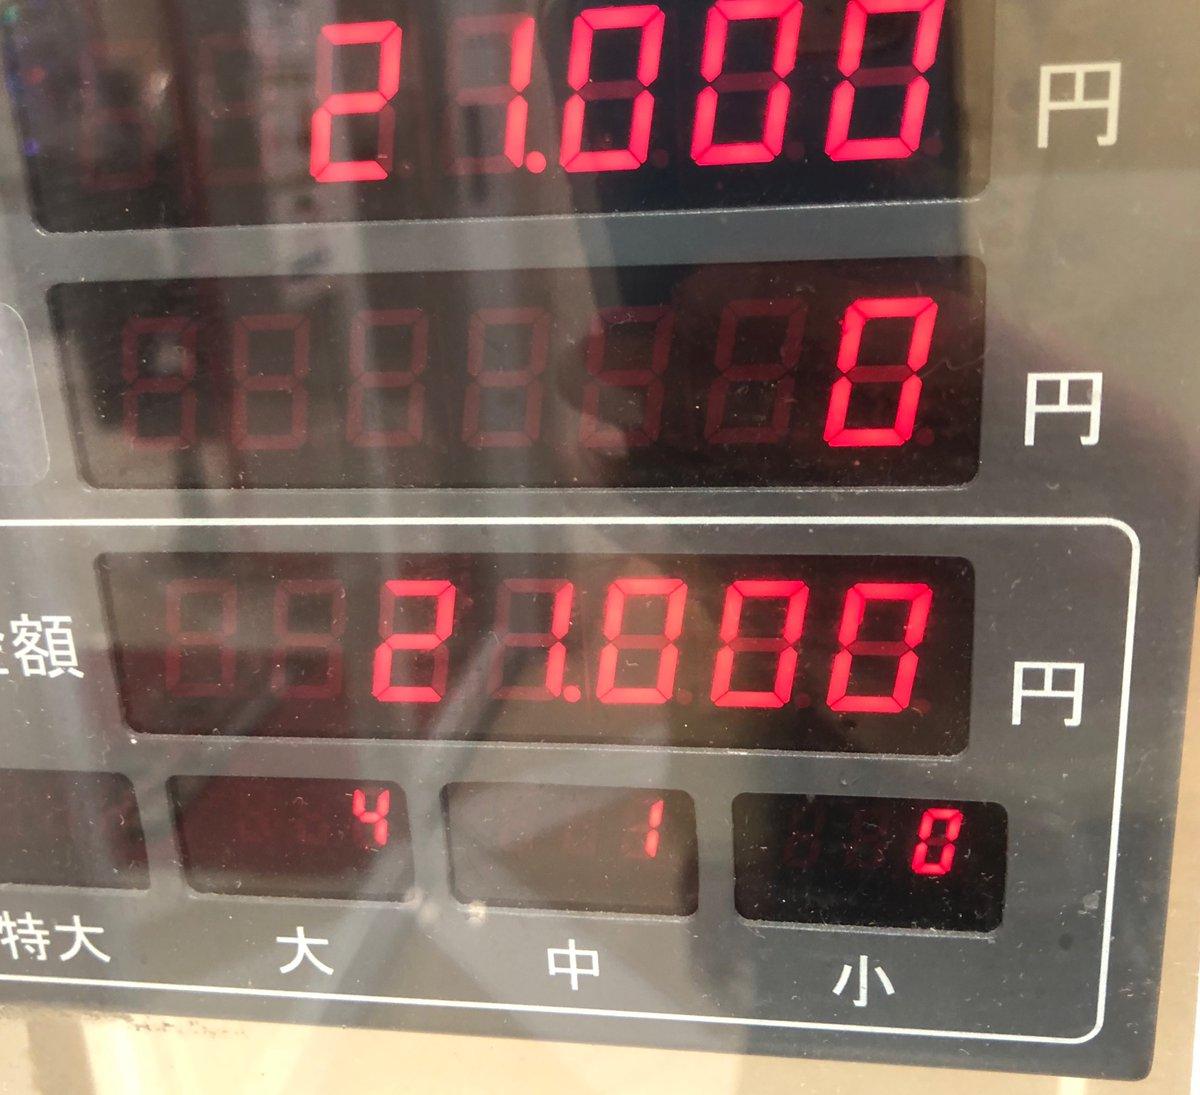 test ツイッターメディア - 朝イチ・ジャグラー激闘の末 2千枚over  ぱちミドルAKB2、オスイチ5千発  合計6万勝ち… 疲れた…  #マイジャグラー3 #AKB2 https://t.co/SgvlJkBB3F